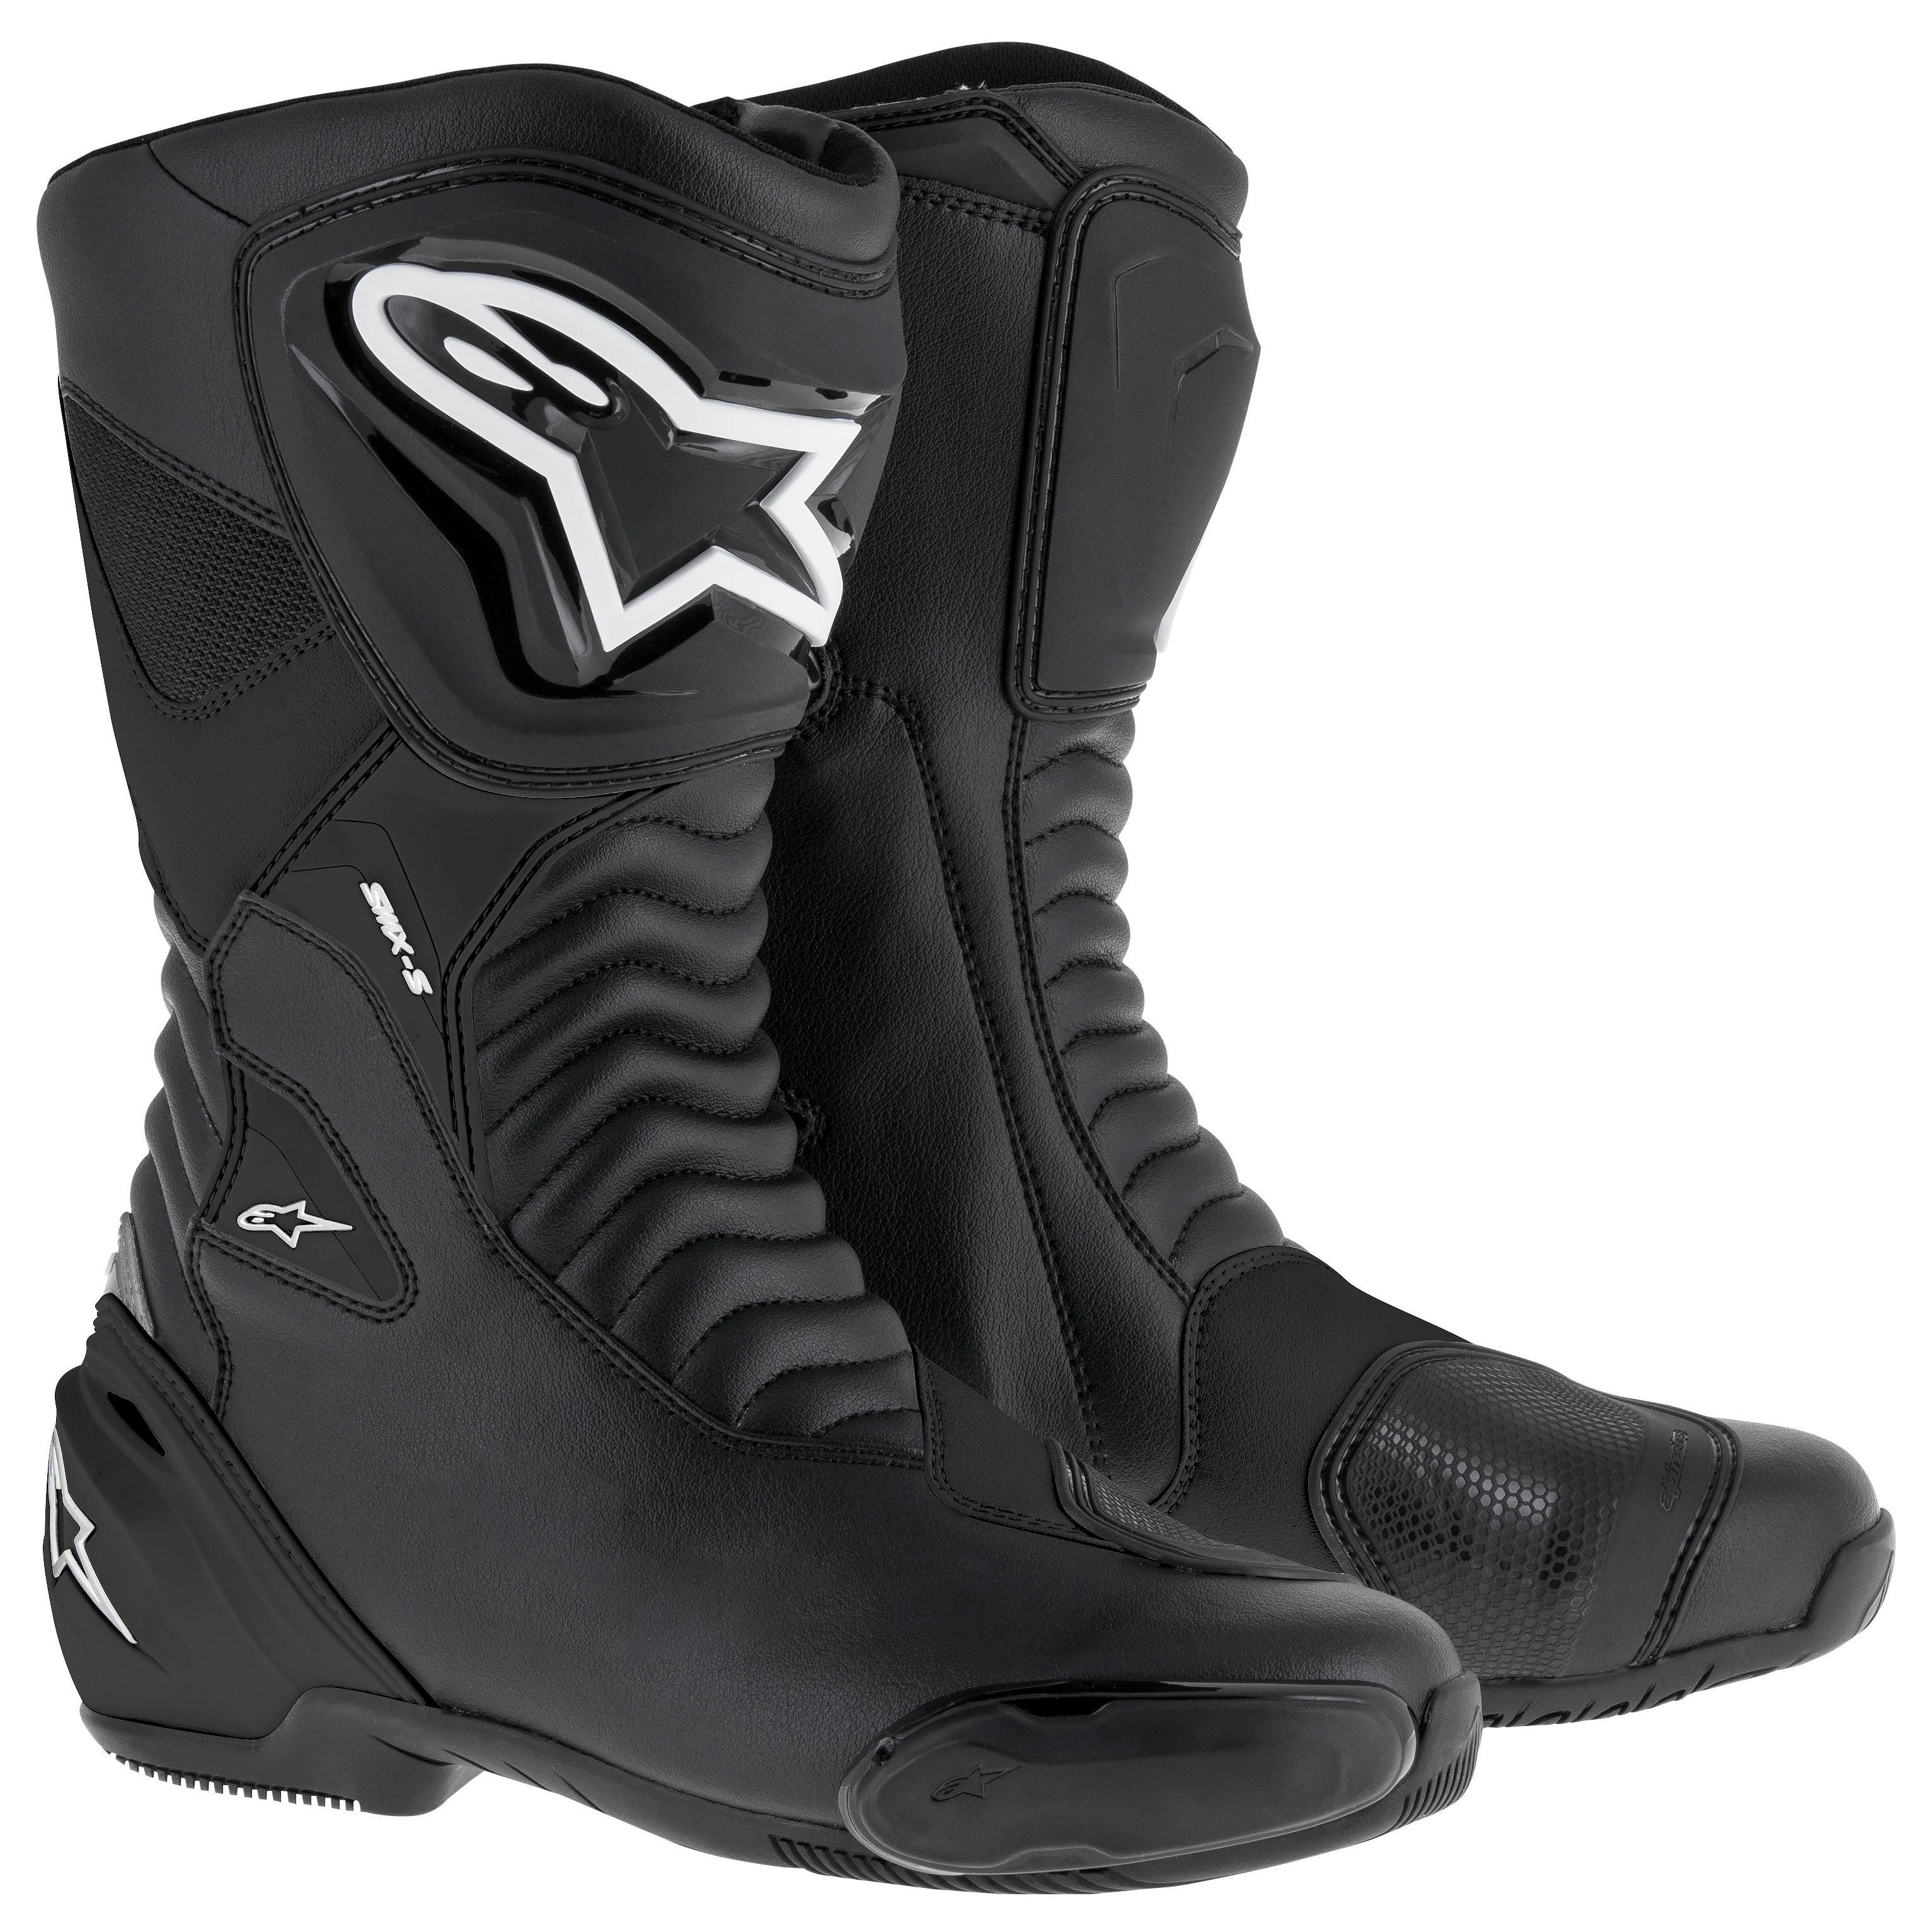 Bottes Moto Alpinestars SMX S - Tailles 43 à 50